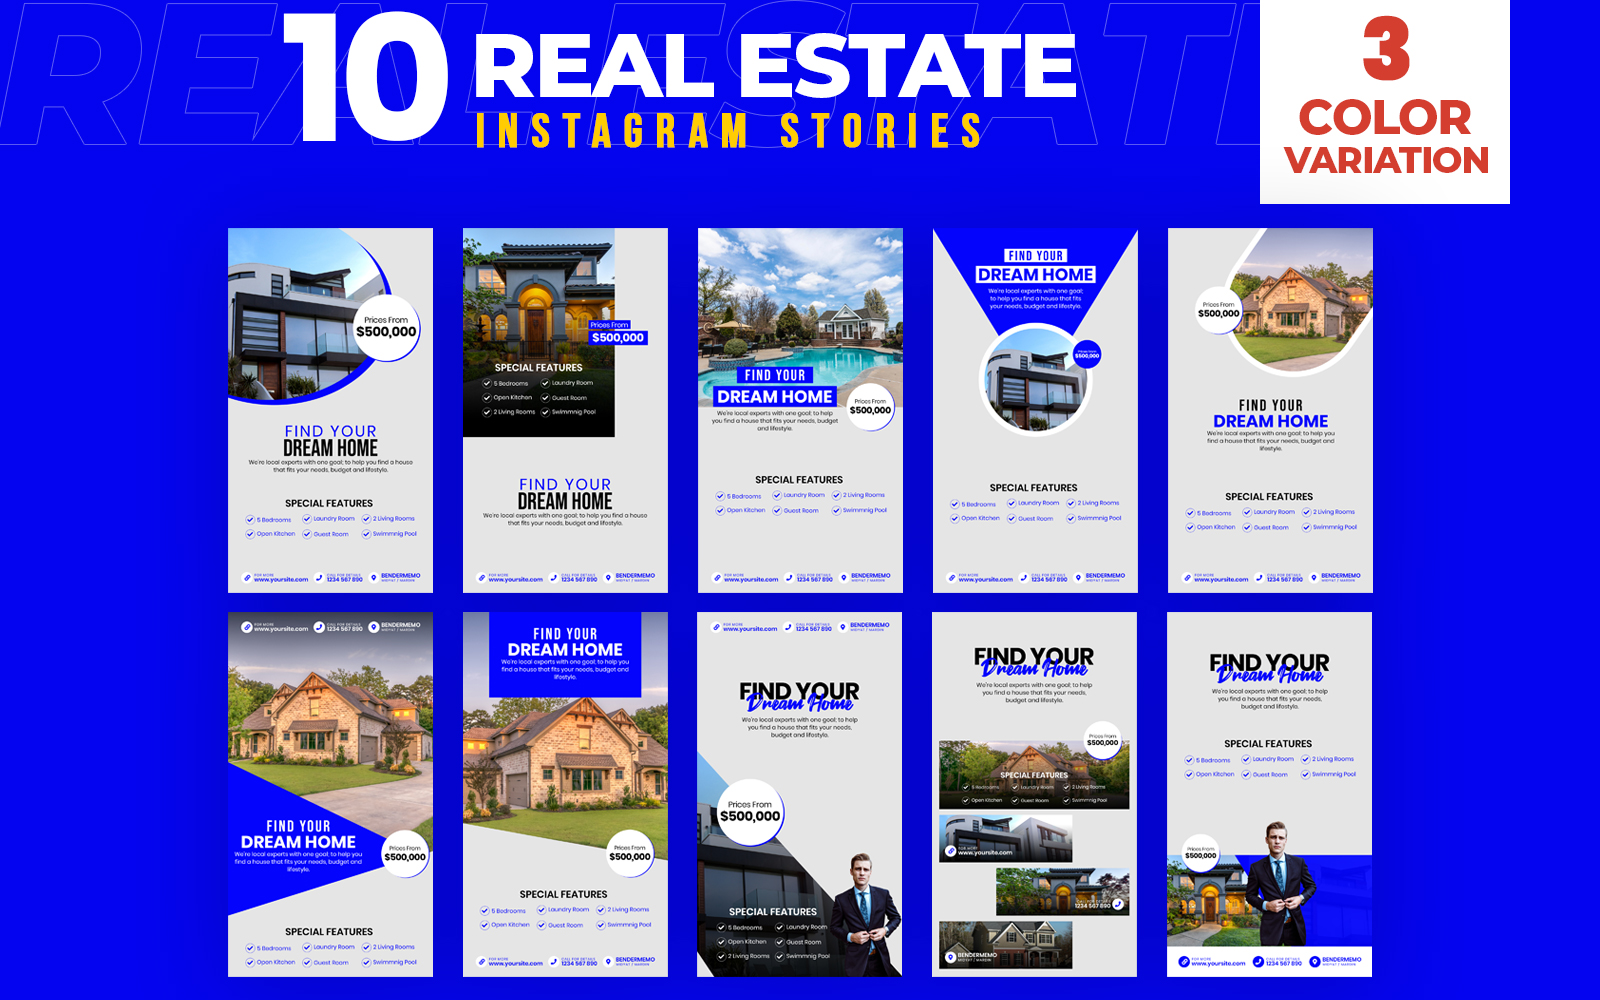 Real Estate 10 Instagram Stories Social Media